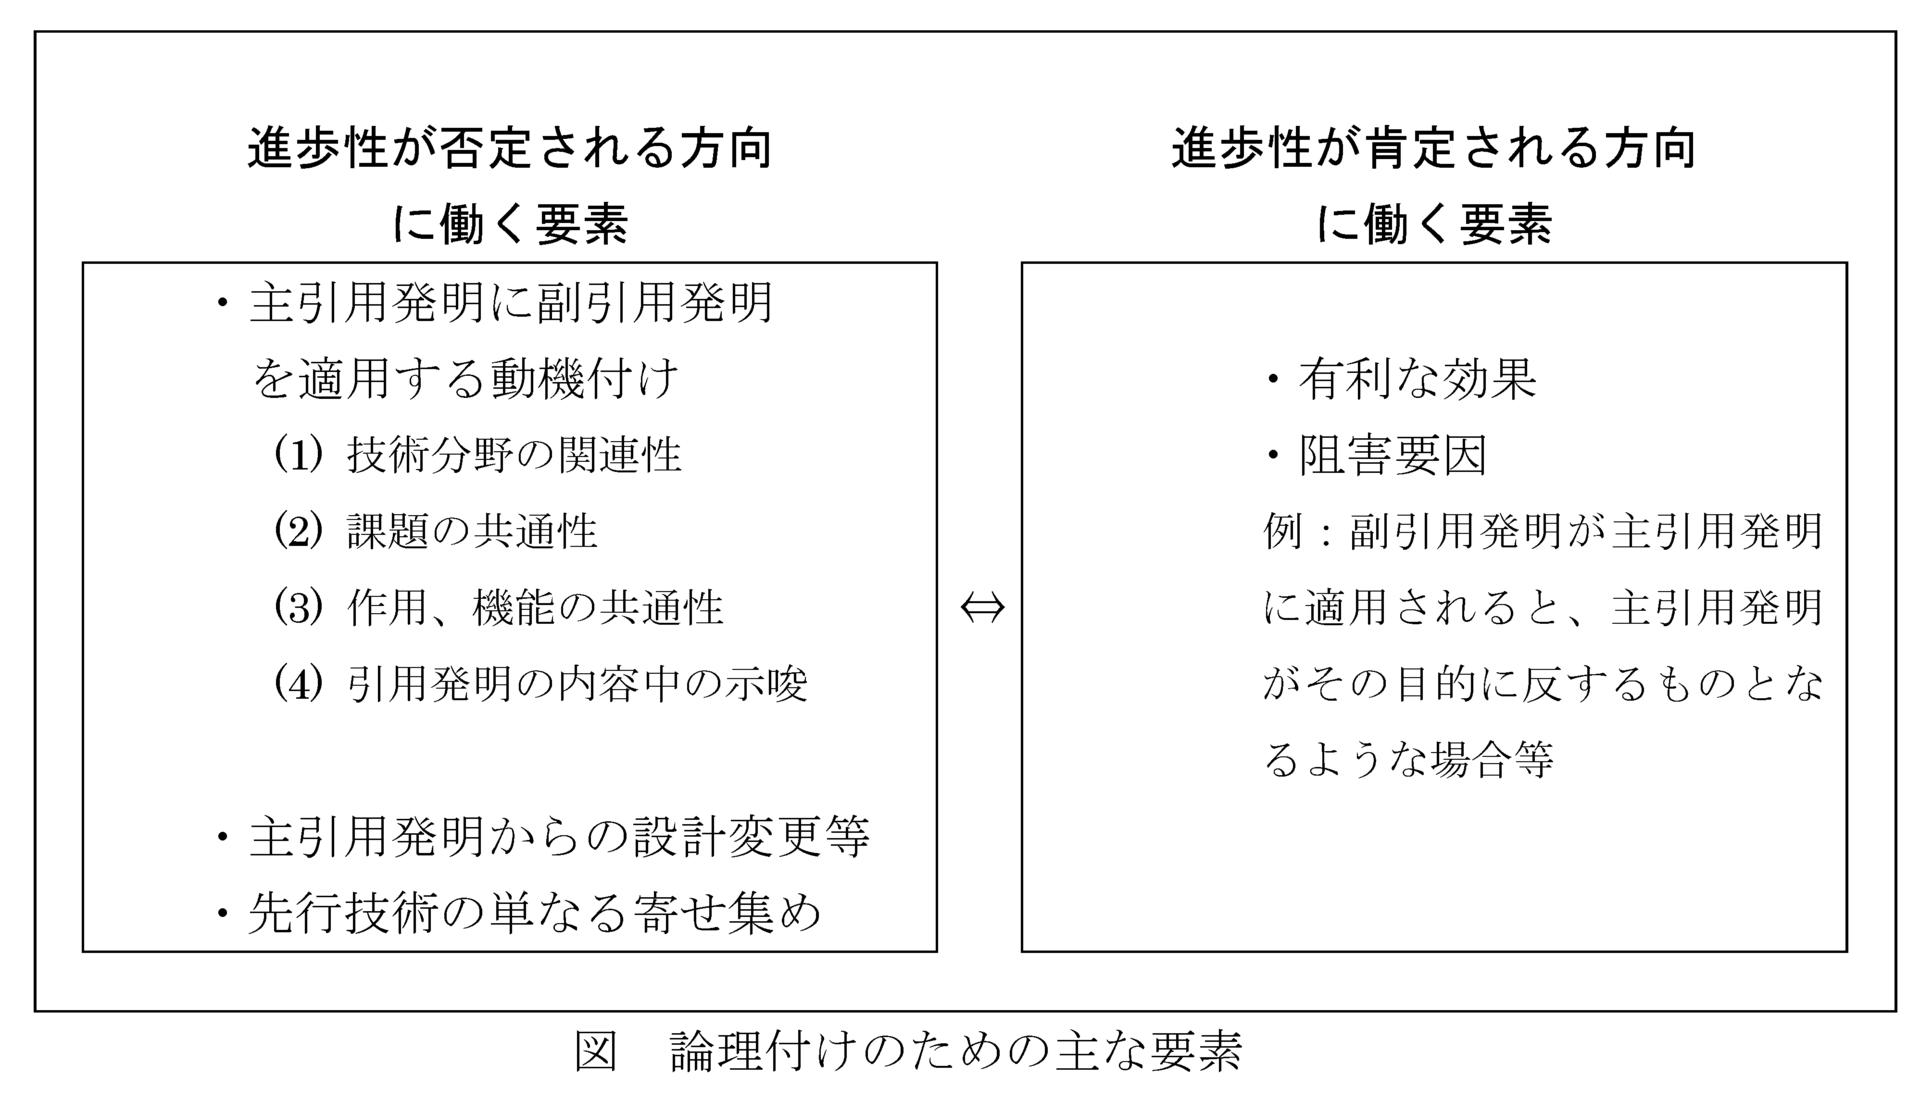 shinsakijunIII-2-2_20191007.png